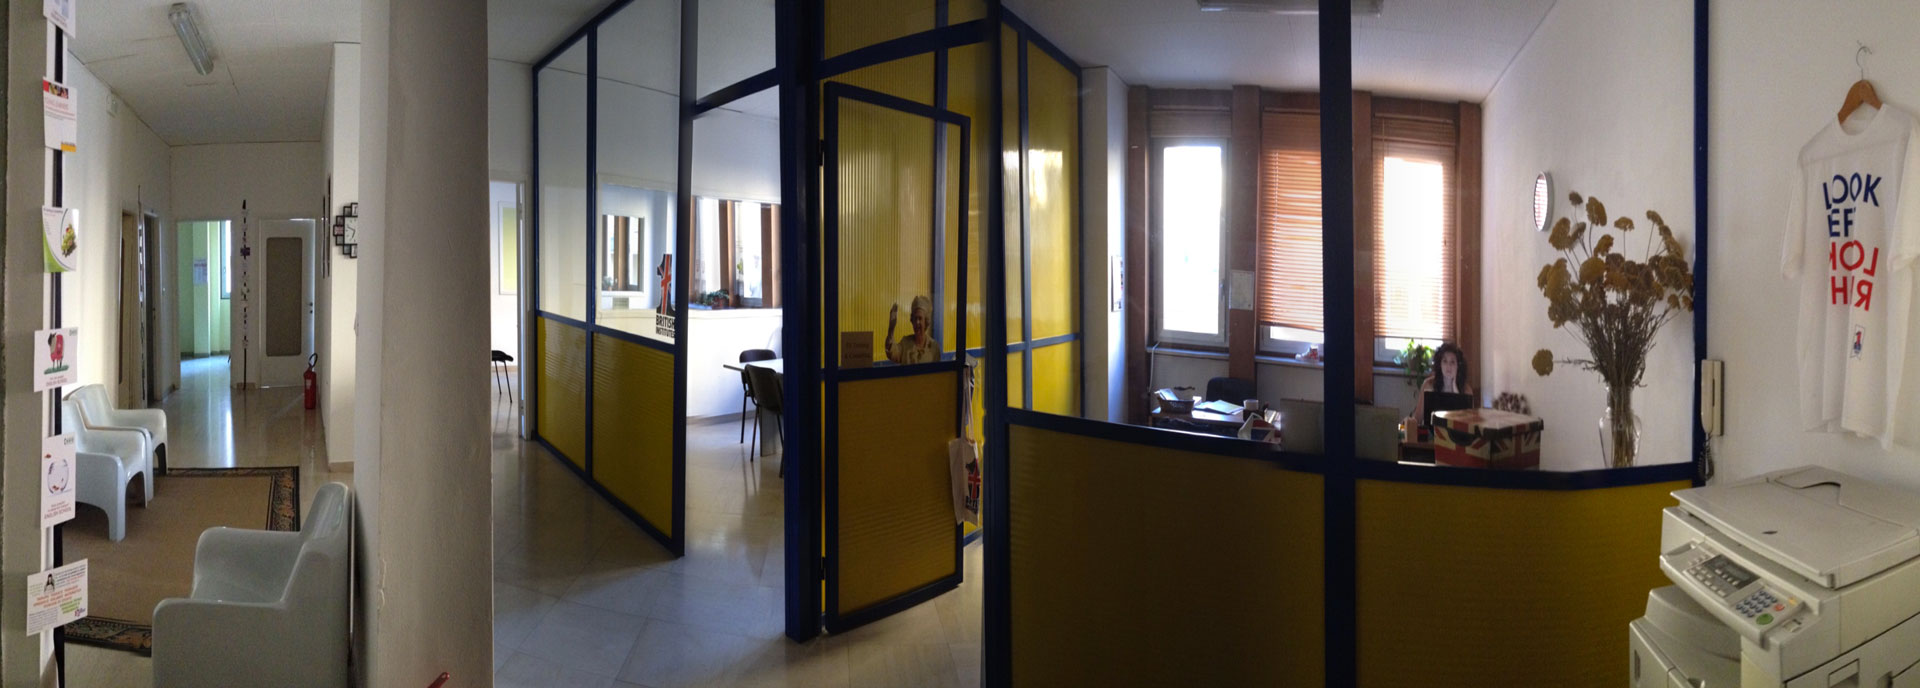 La nostra sede di Vercelli